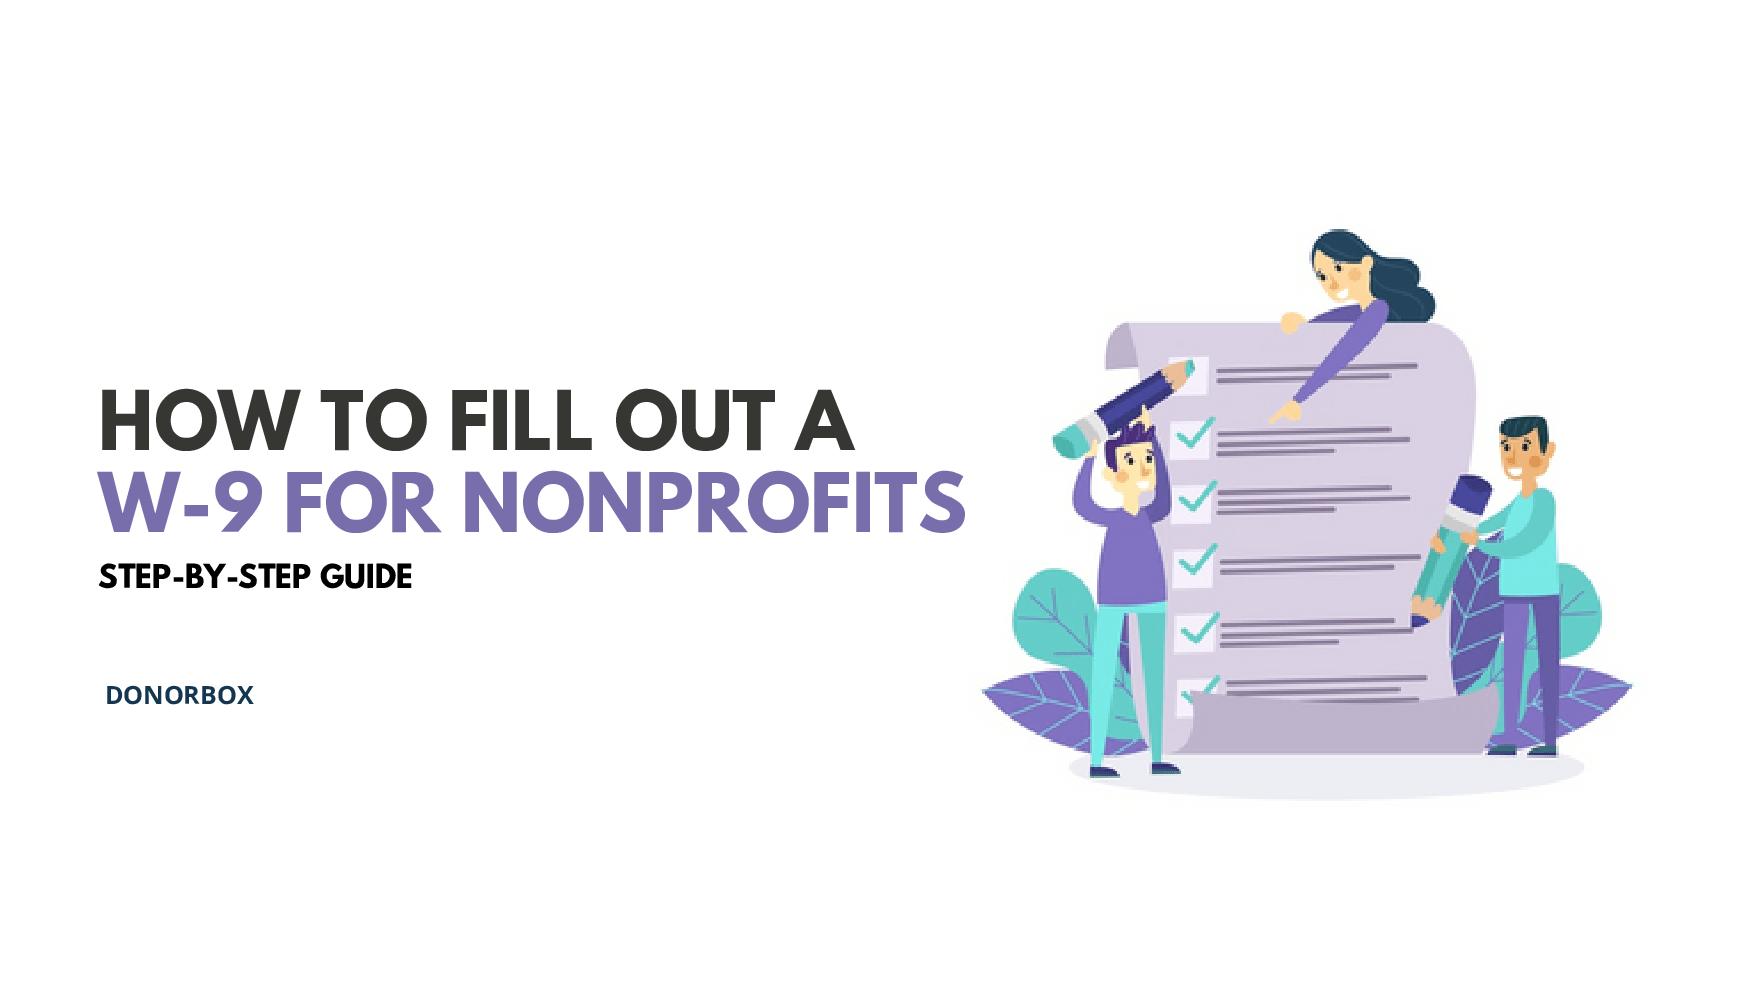 w-9 for nonprofits